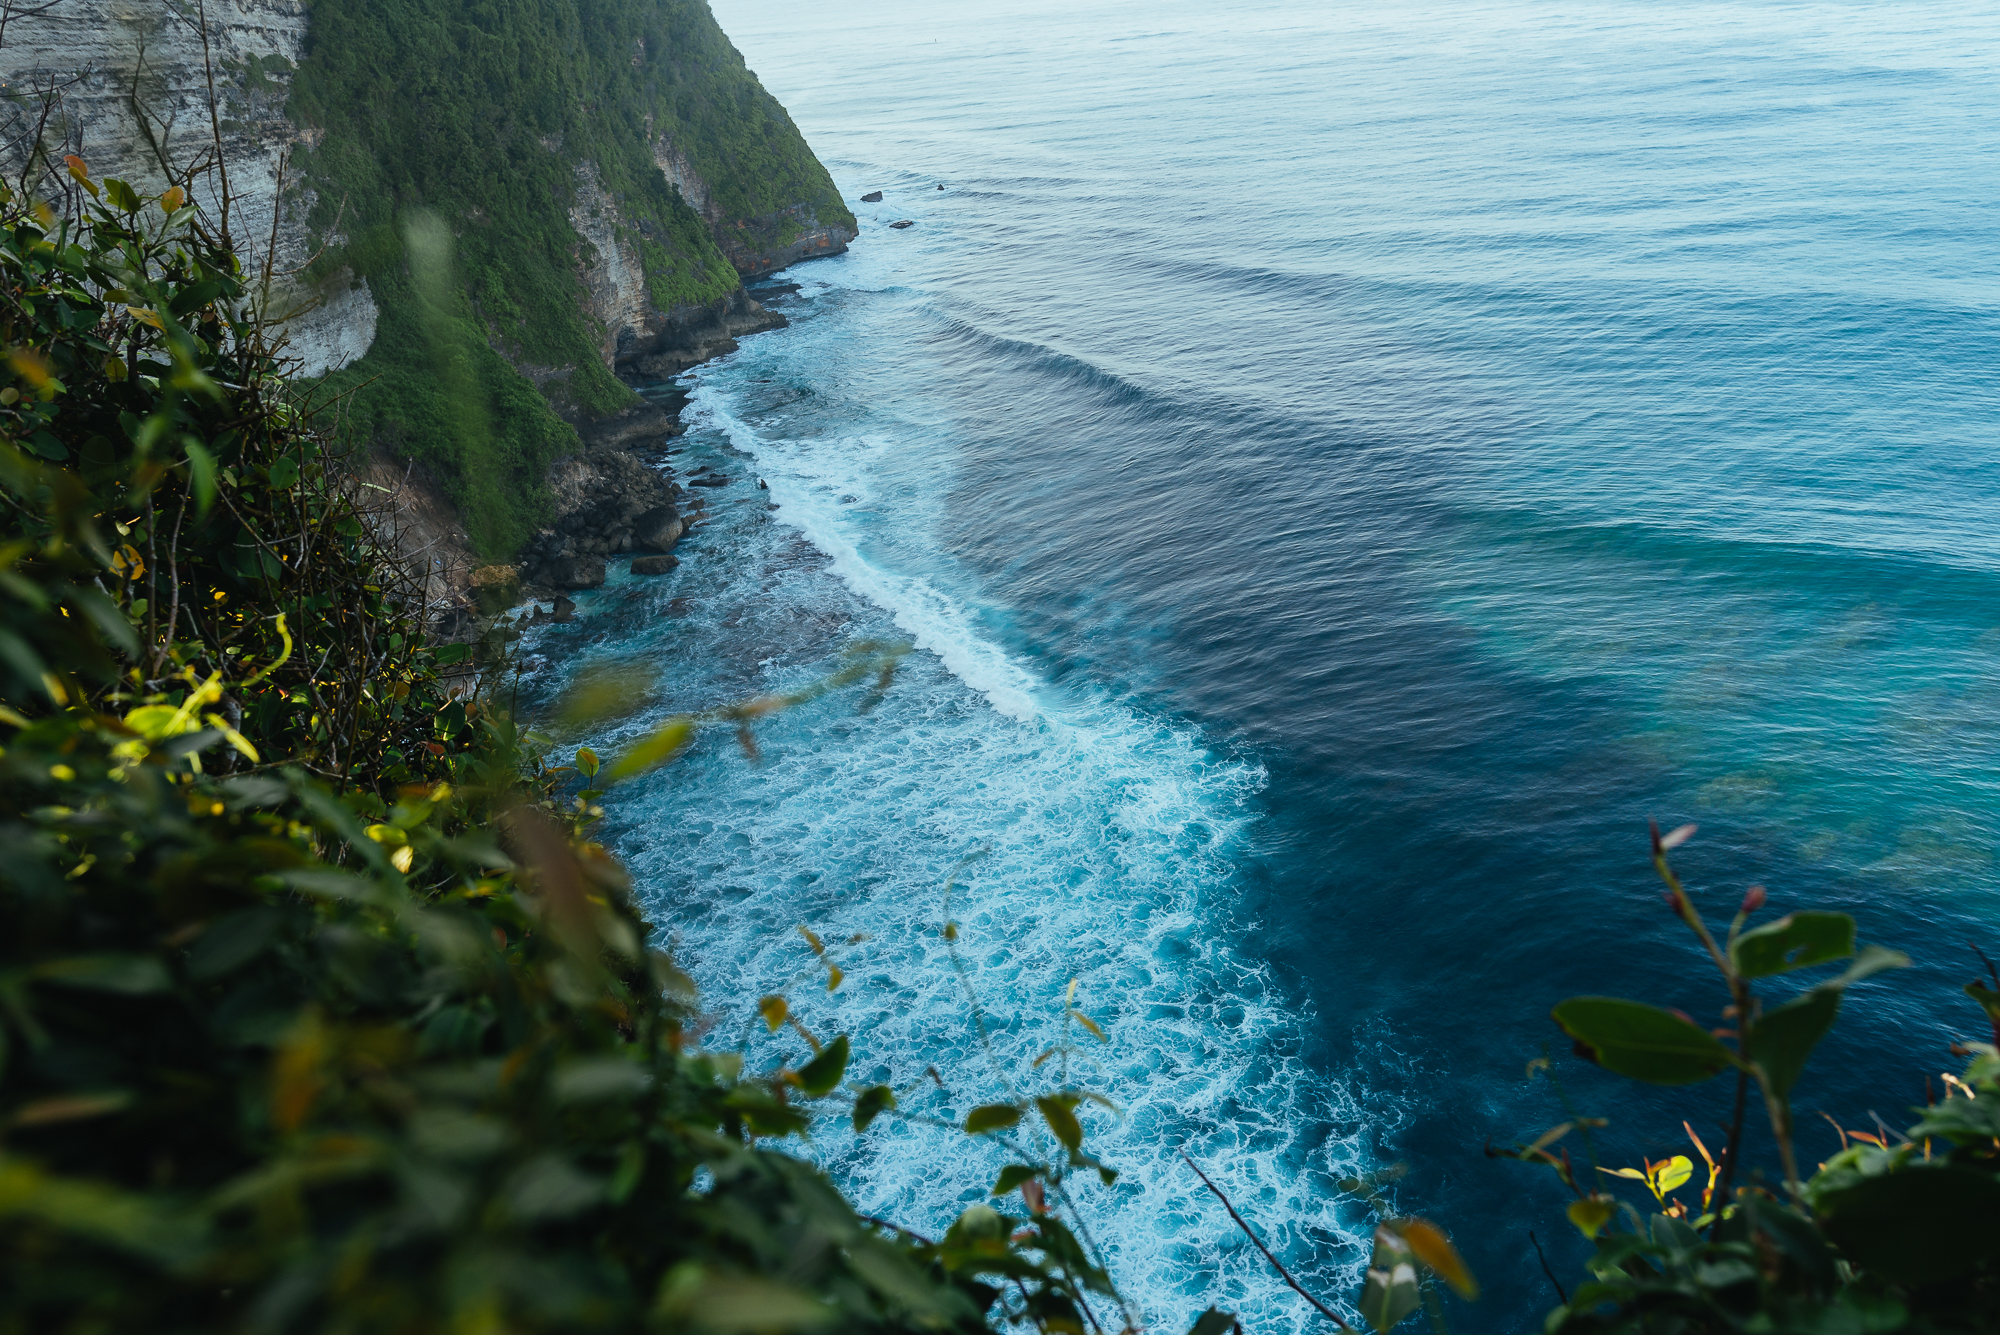 '17 - Bali, Lombok, Komodo & Yogyakarta